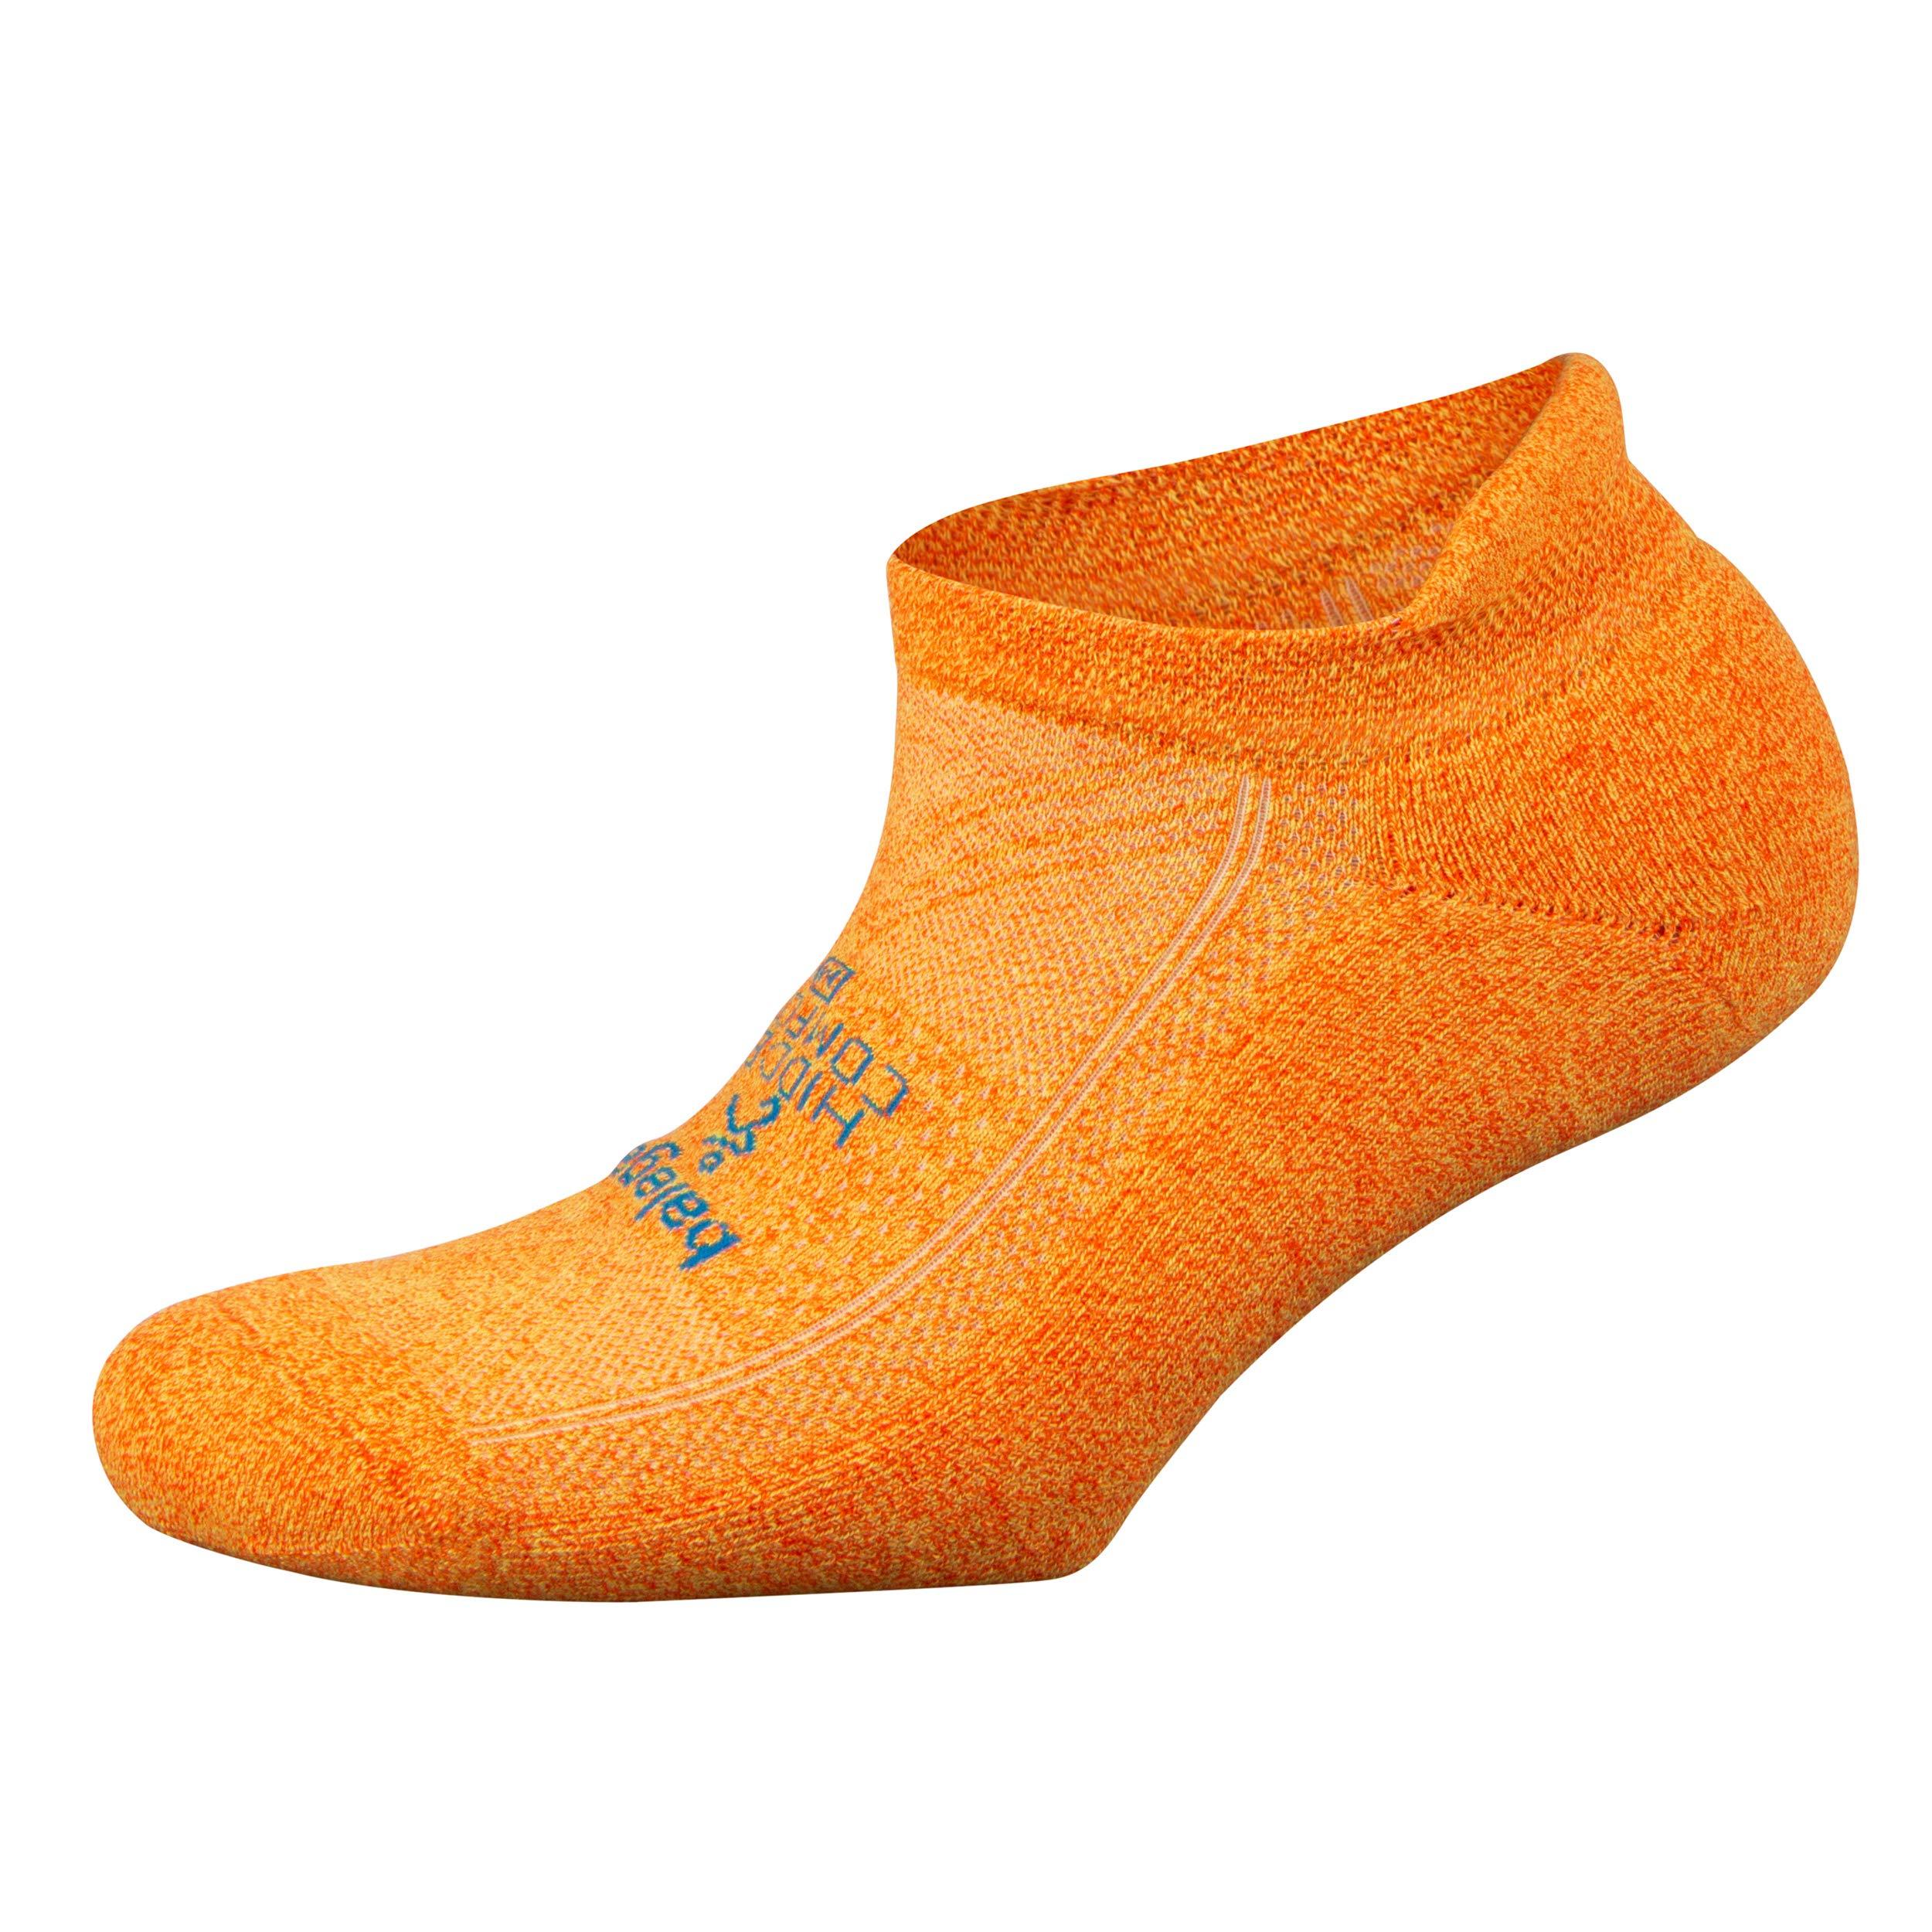 Balega Hidden Comfort No-Show Running Socks for Men and Women (1 Pair), Tangerine, Small by Balega